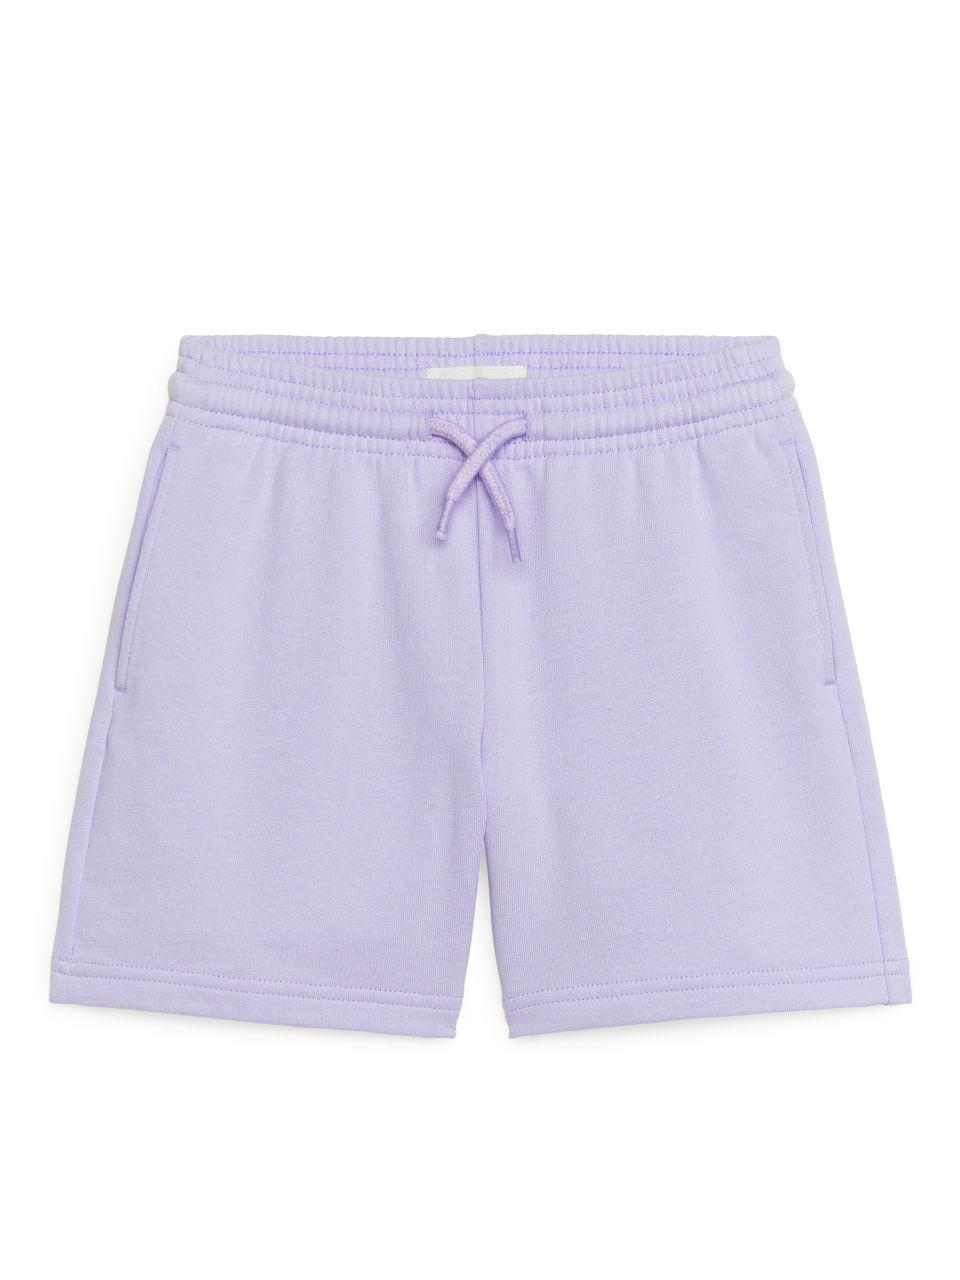 Sweatshirt Shorts - Purple